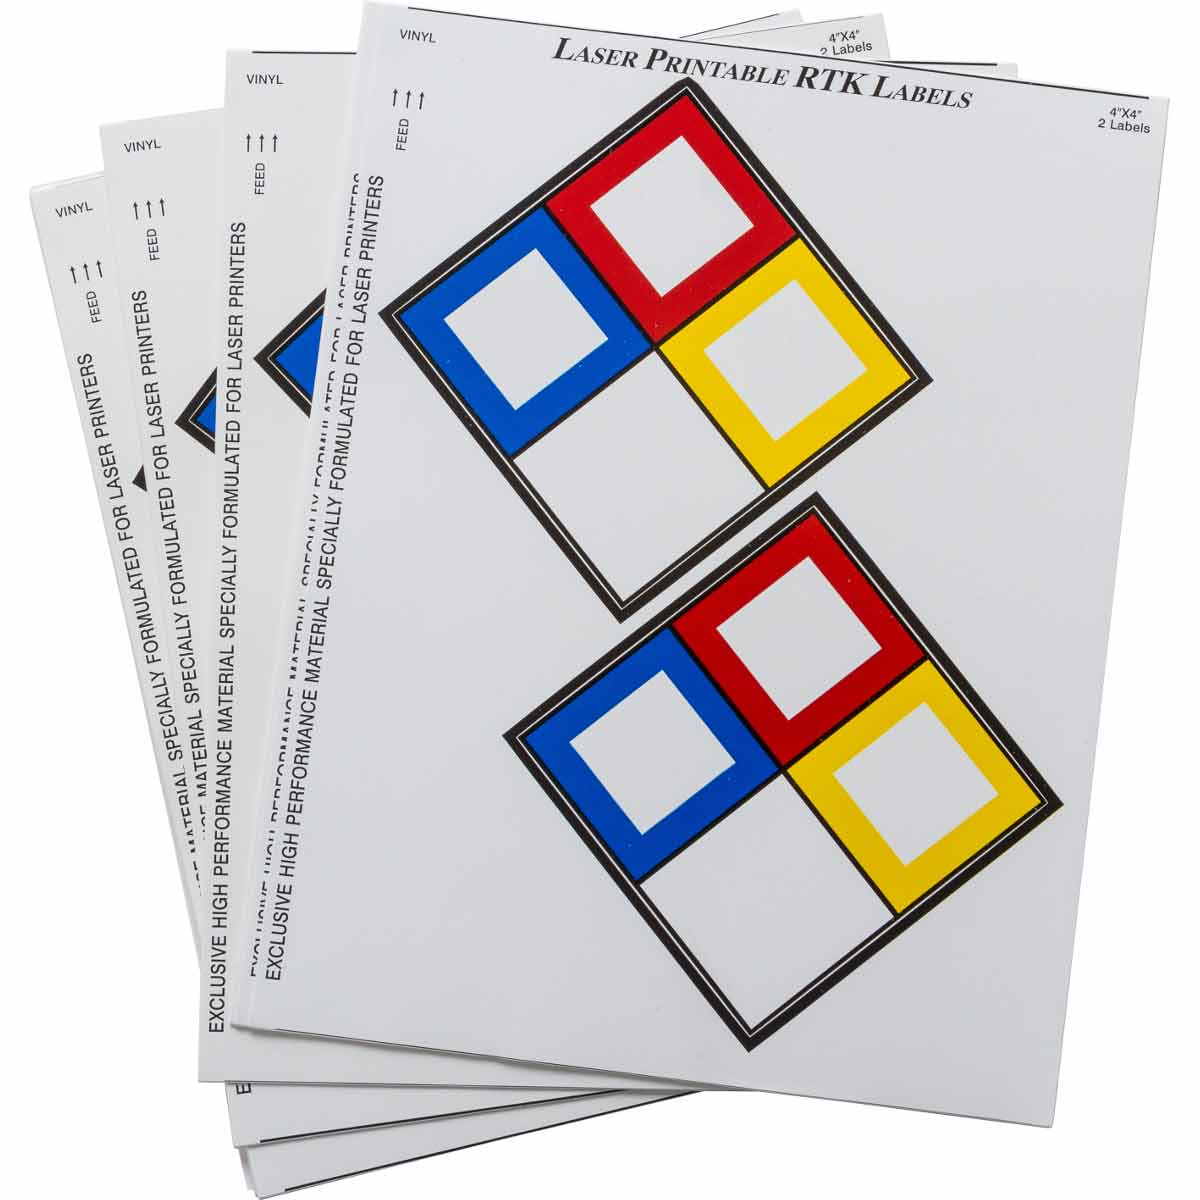 photo regarding Printable Vinyl Laser Printer called Laser Printable Vinyl Instantly-toward-Recognize Label Blanks